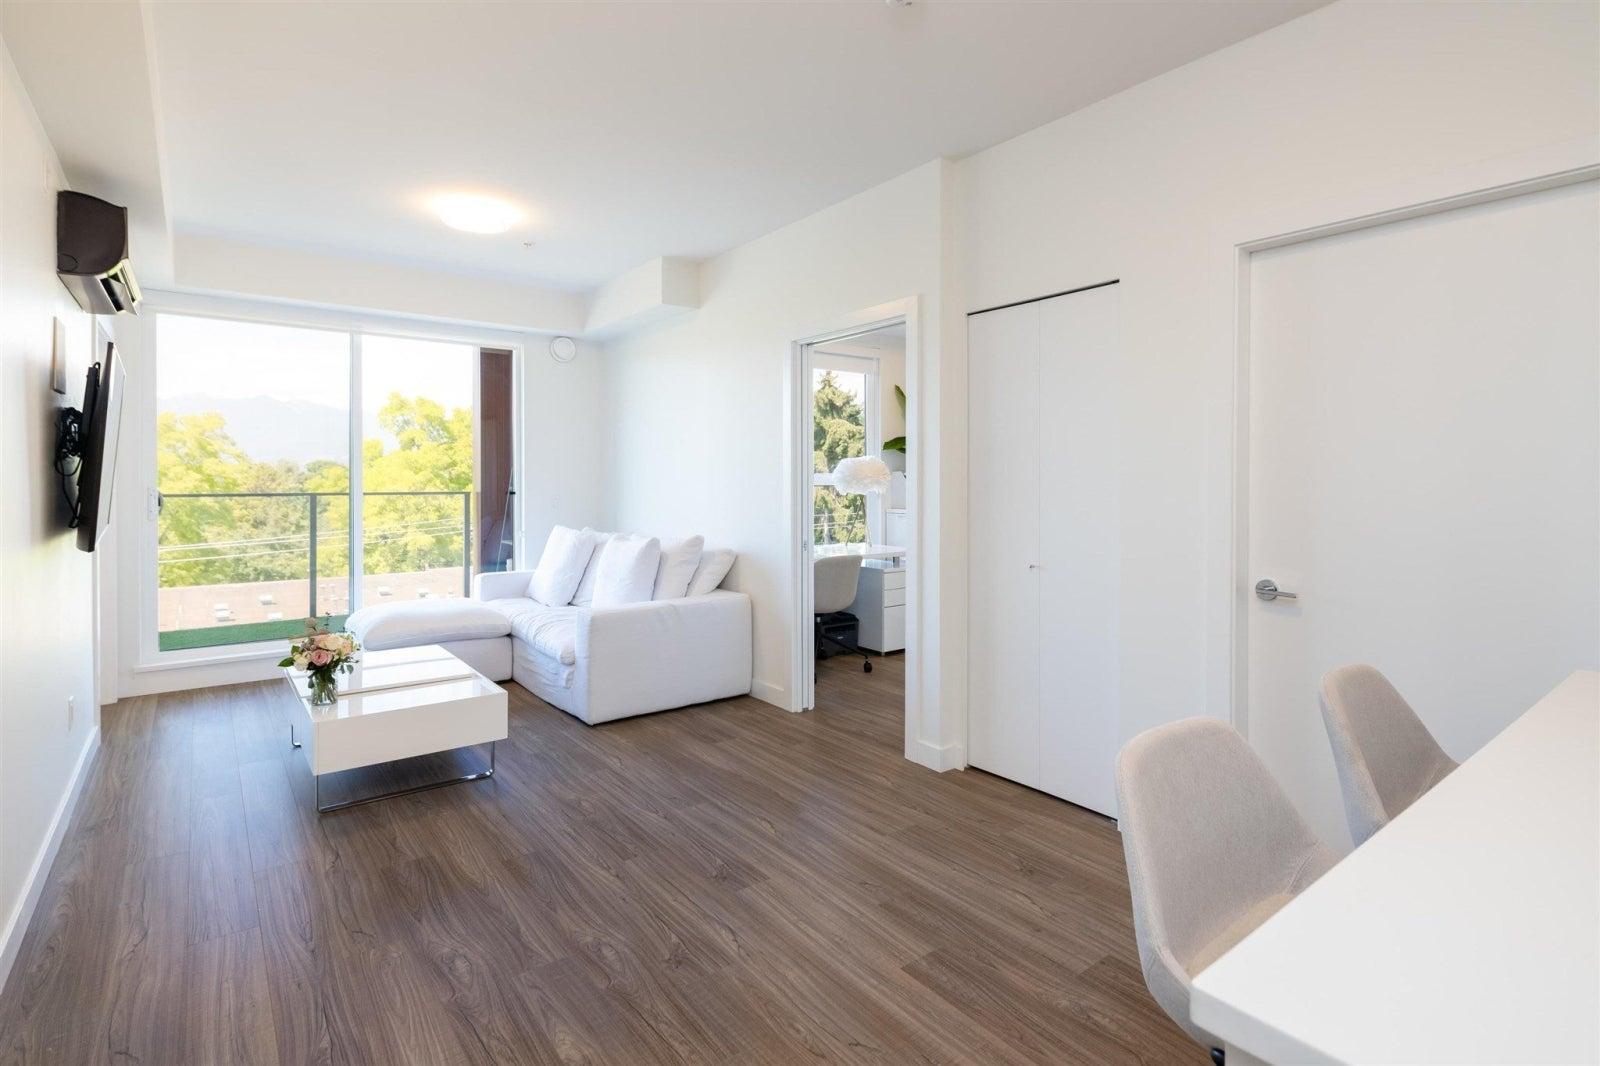 408 379 E BROADWAY AVENUE - Mount Pleasant VE Apartment/Condo for sale, 2 Bedrooms (R2599900) #8